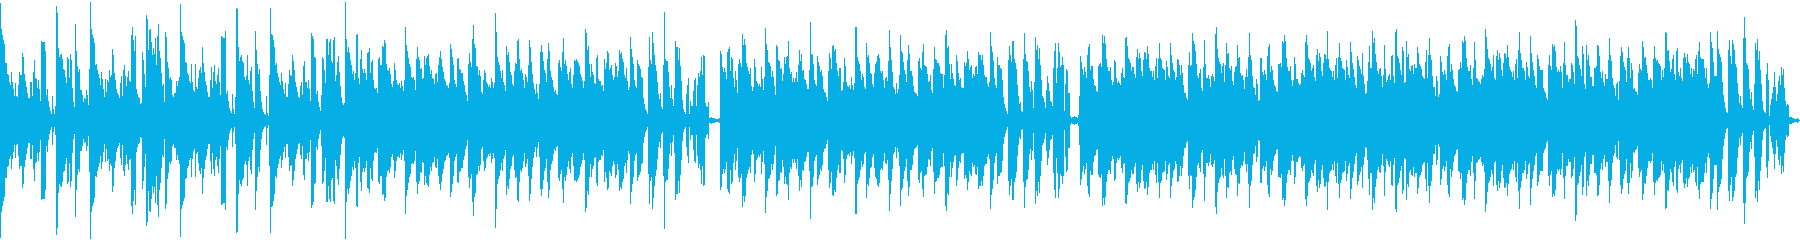 Comical / quiet karaoke loop specifications's reproduced waveform